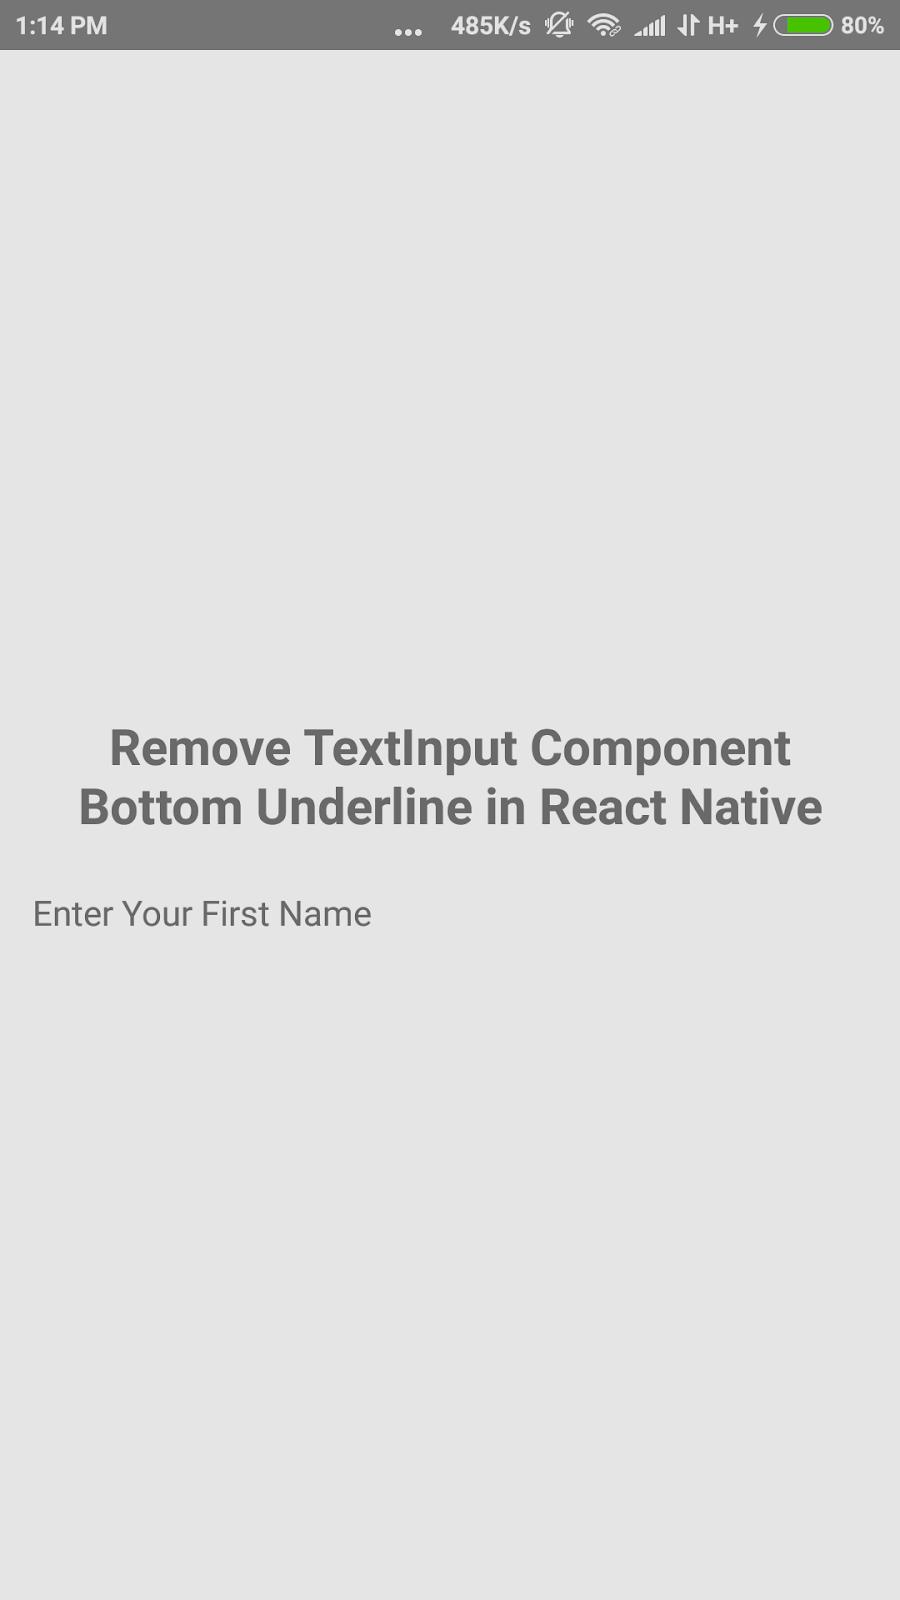 Remove TextInput Component Bottom Underline in React Native | SKPTRICKS